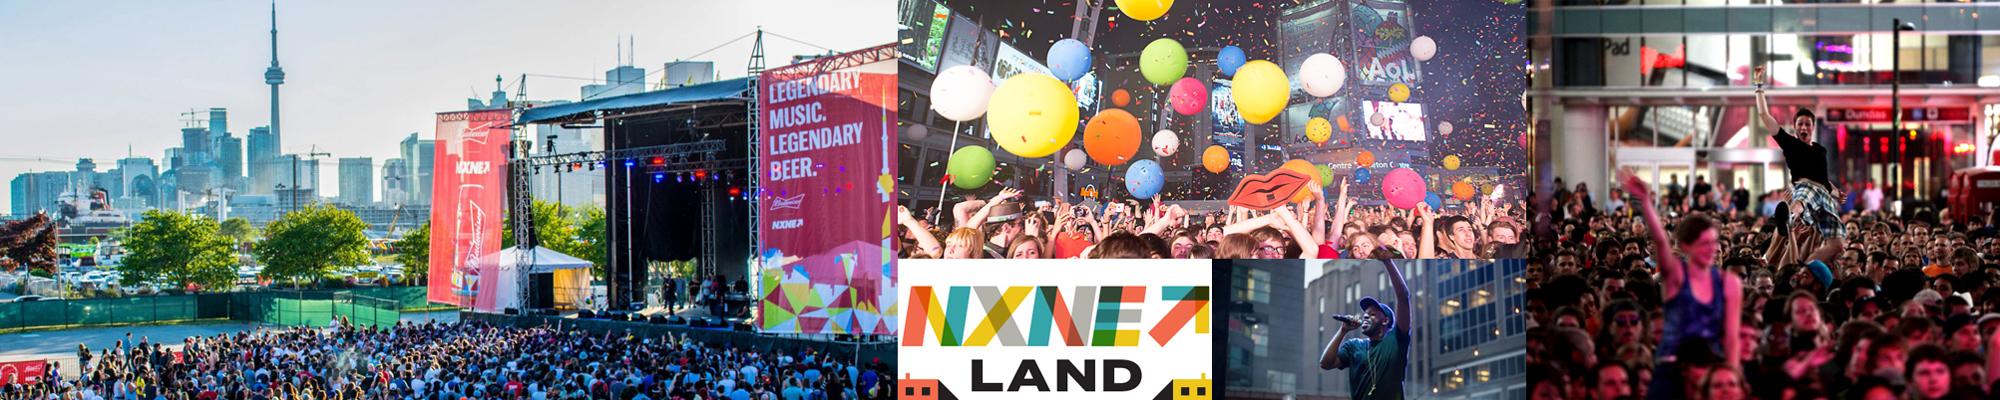 Festival musicali Canada: NXNE festival